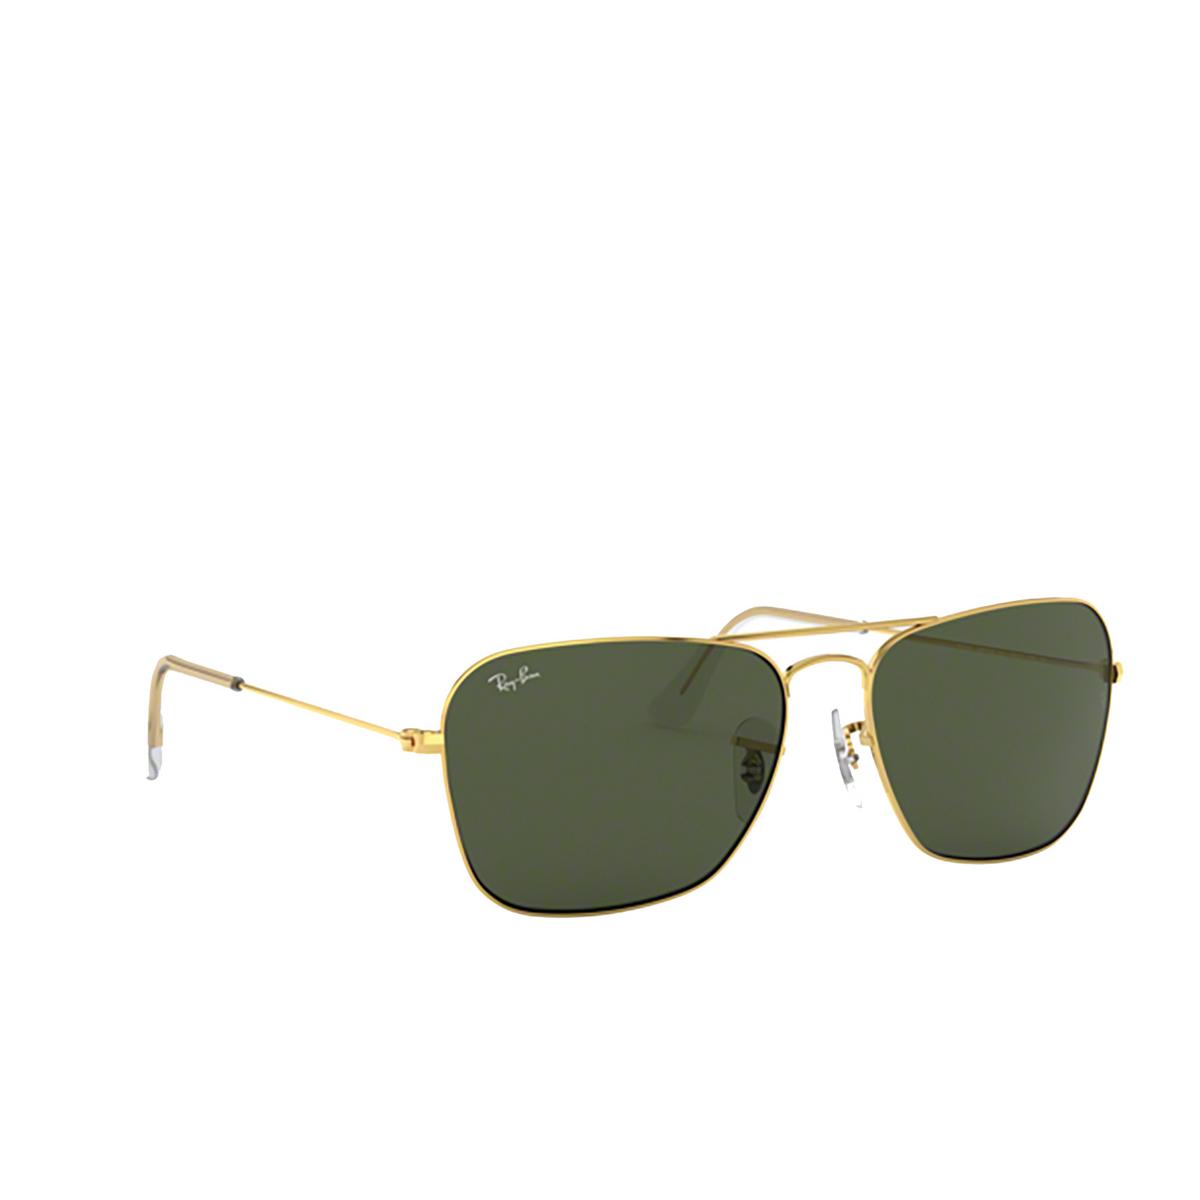 Ray-Ban® Square Sunglasses: Caravan RB3136 color Arista 001 - 2/3.